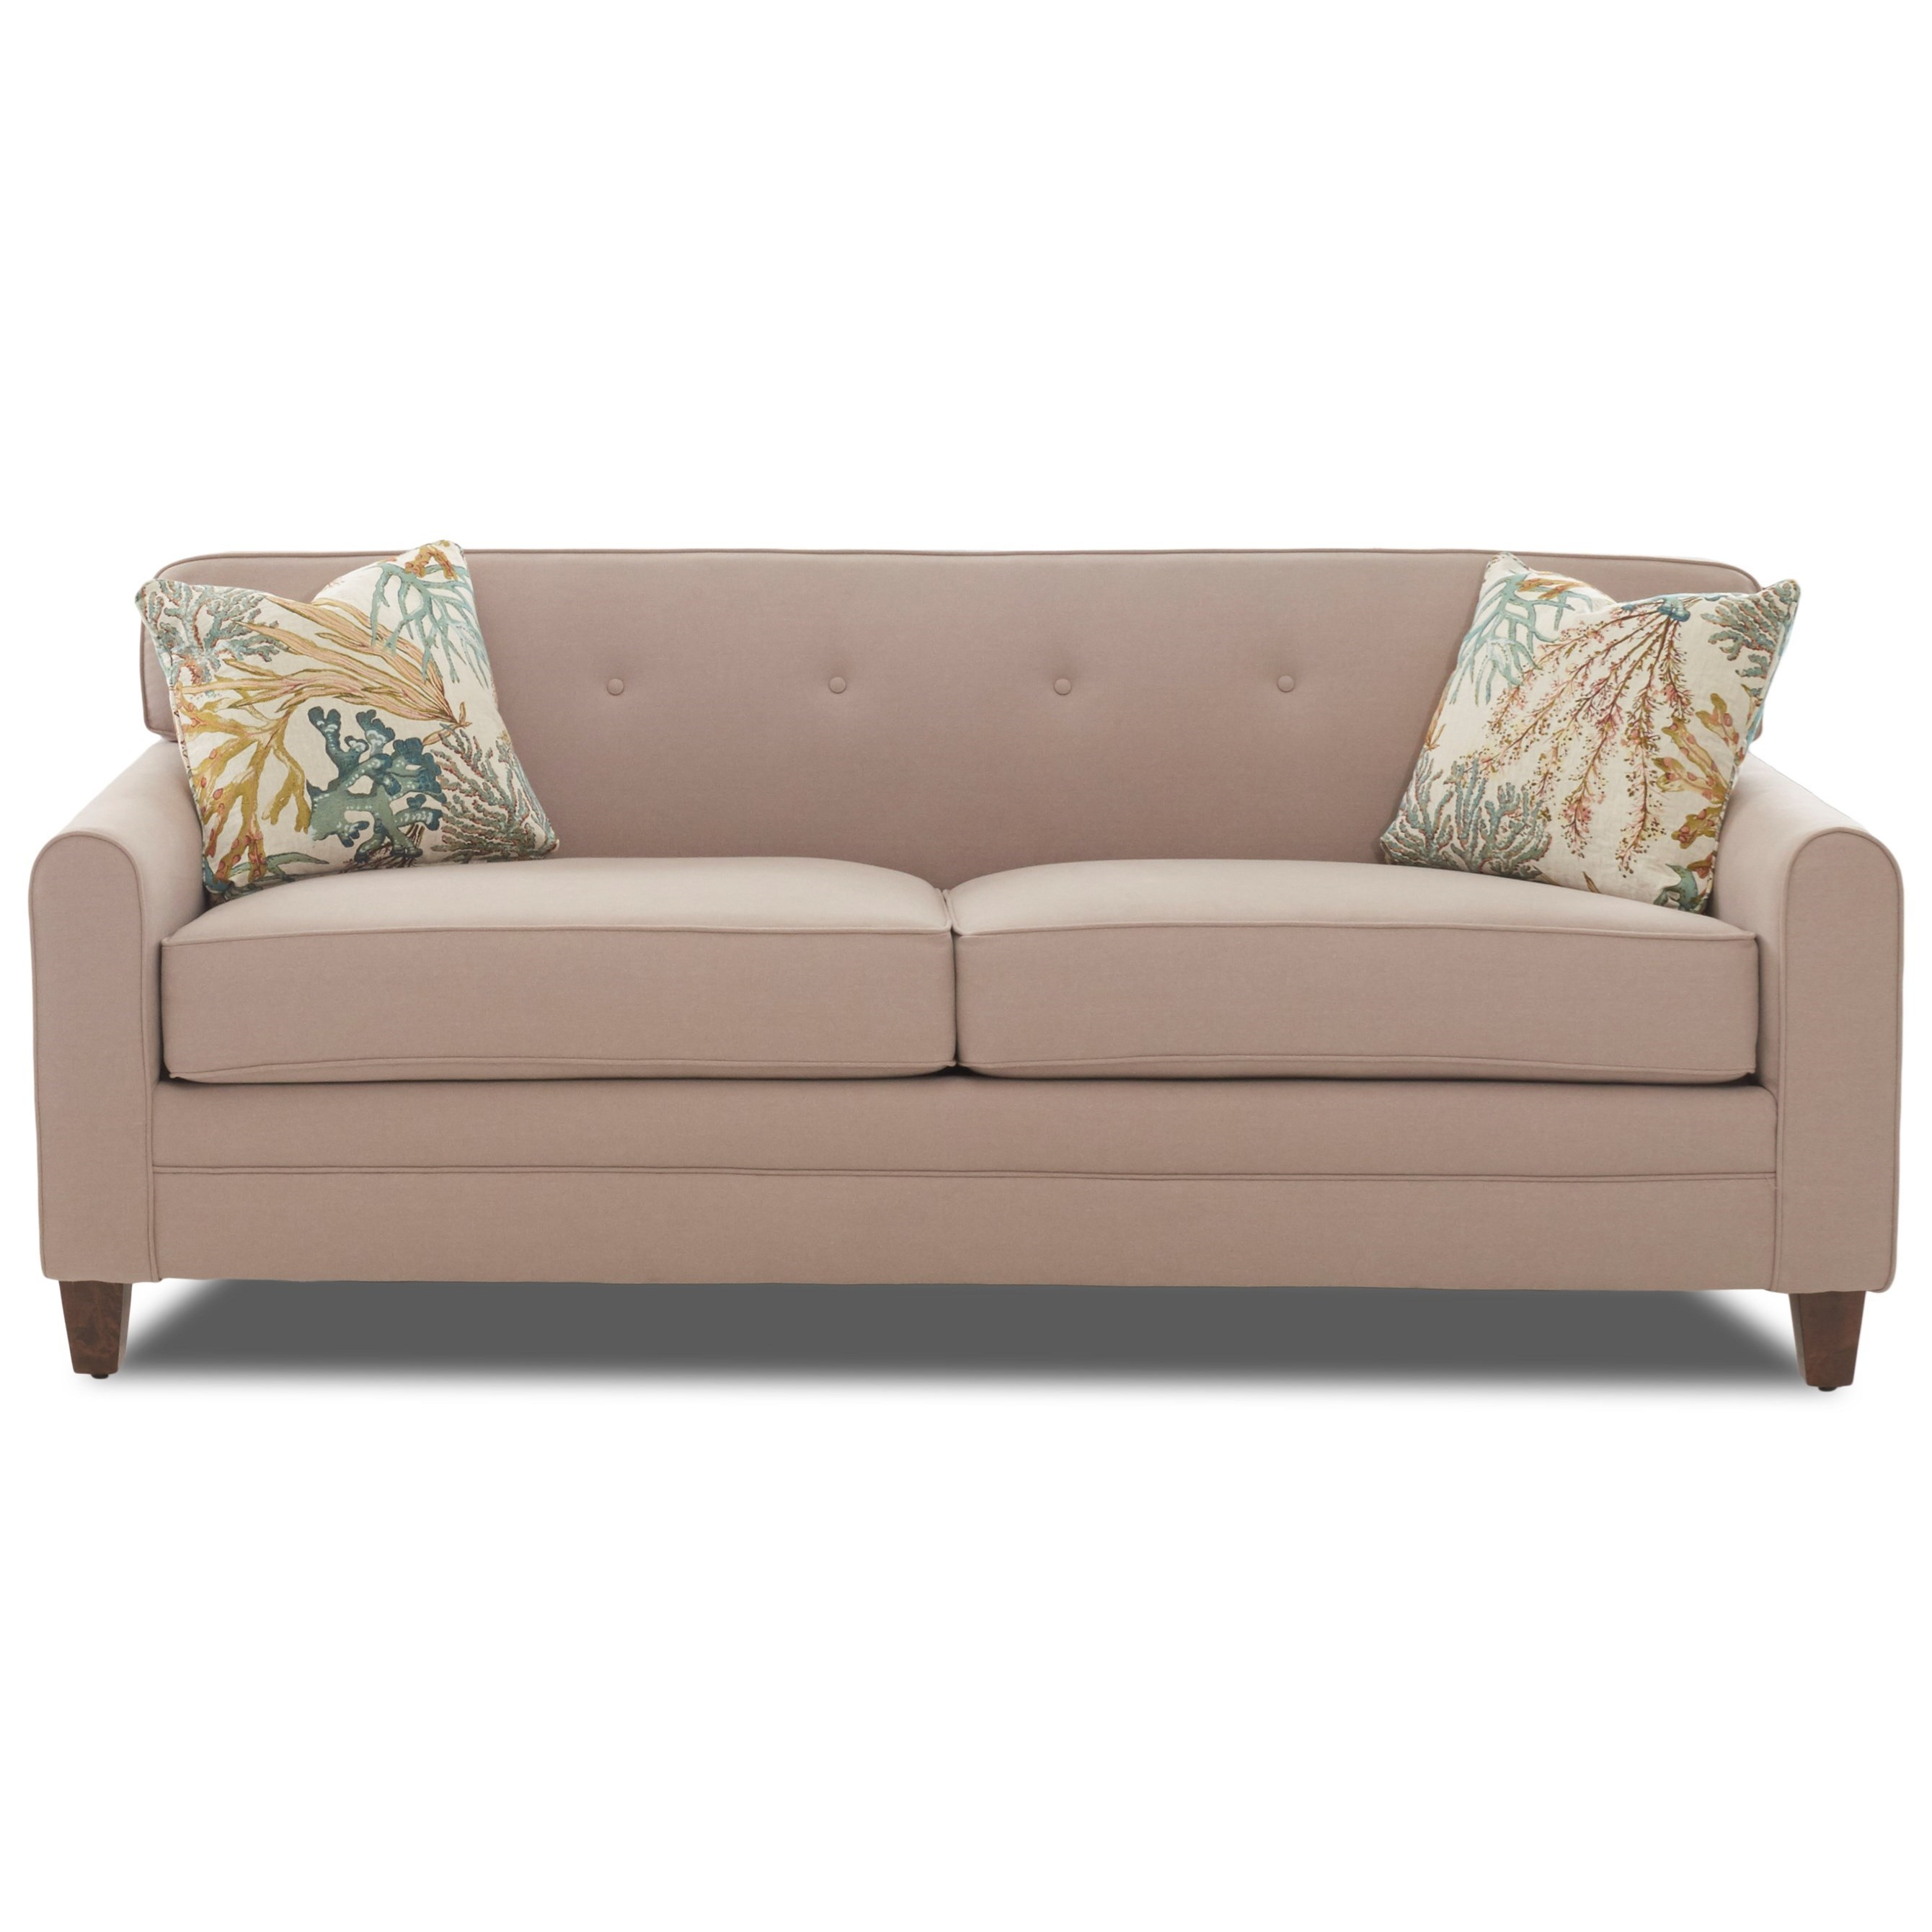 elliston place peyton mid century modern sleeper sofa with enso rh morrisathome com Comfort Lounge Memory Foam Sleeper zeb queen sofa sleeper with memory foam mattress by signature design by ashley